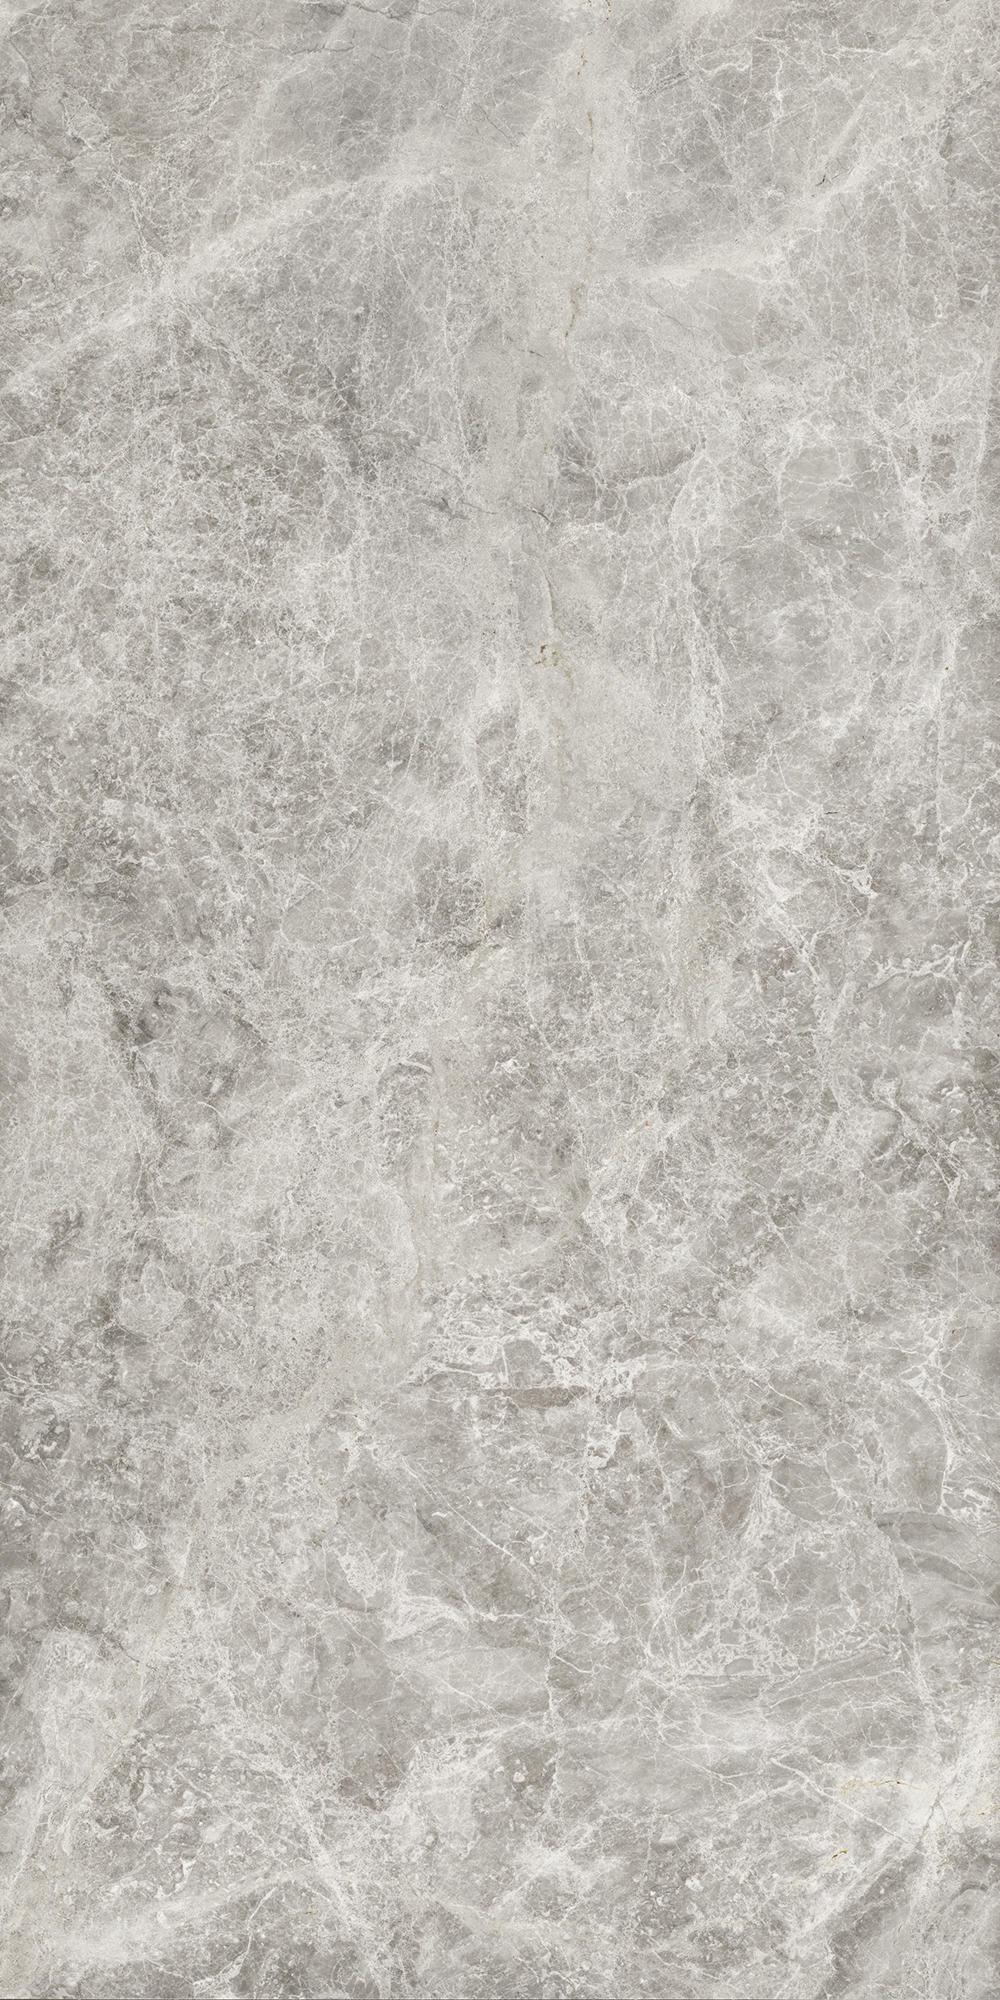 BIG SLABS | MADRID SILVER - Natural stone panels from Gani Marble ...